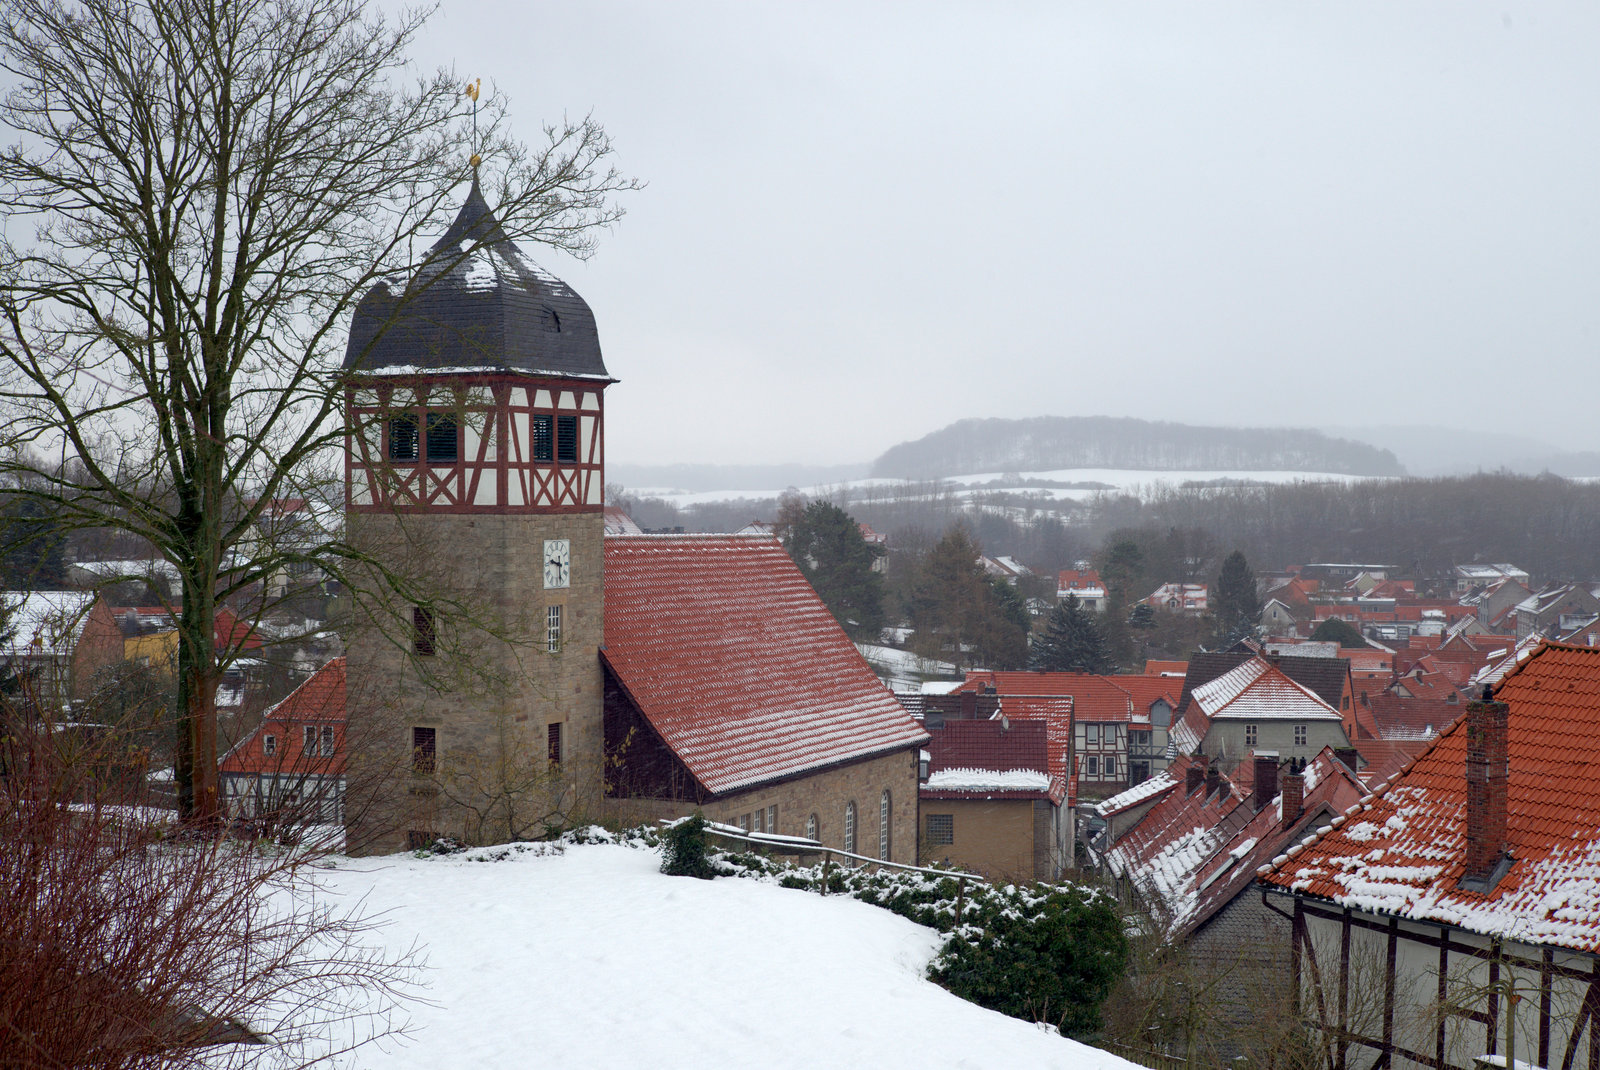 Schloss Adelebsen, Germany